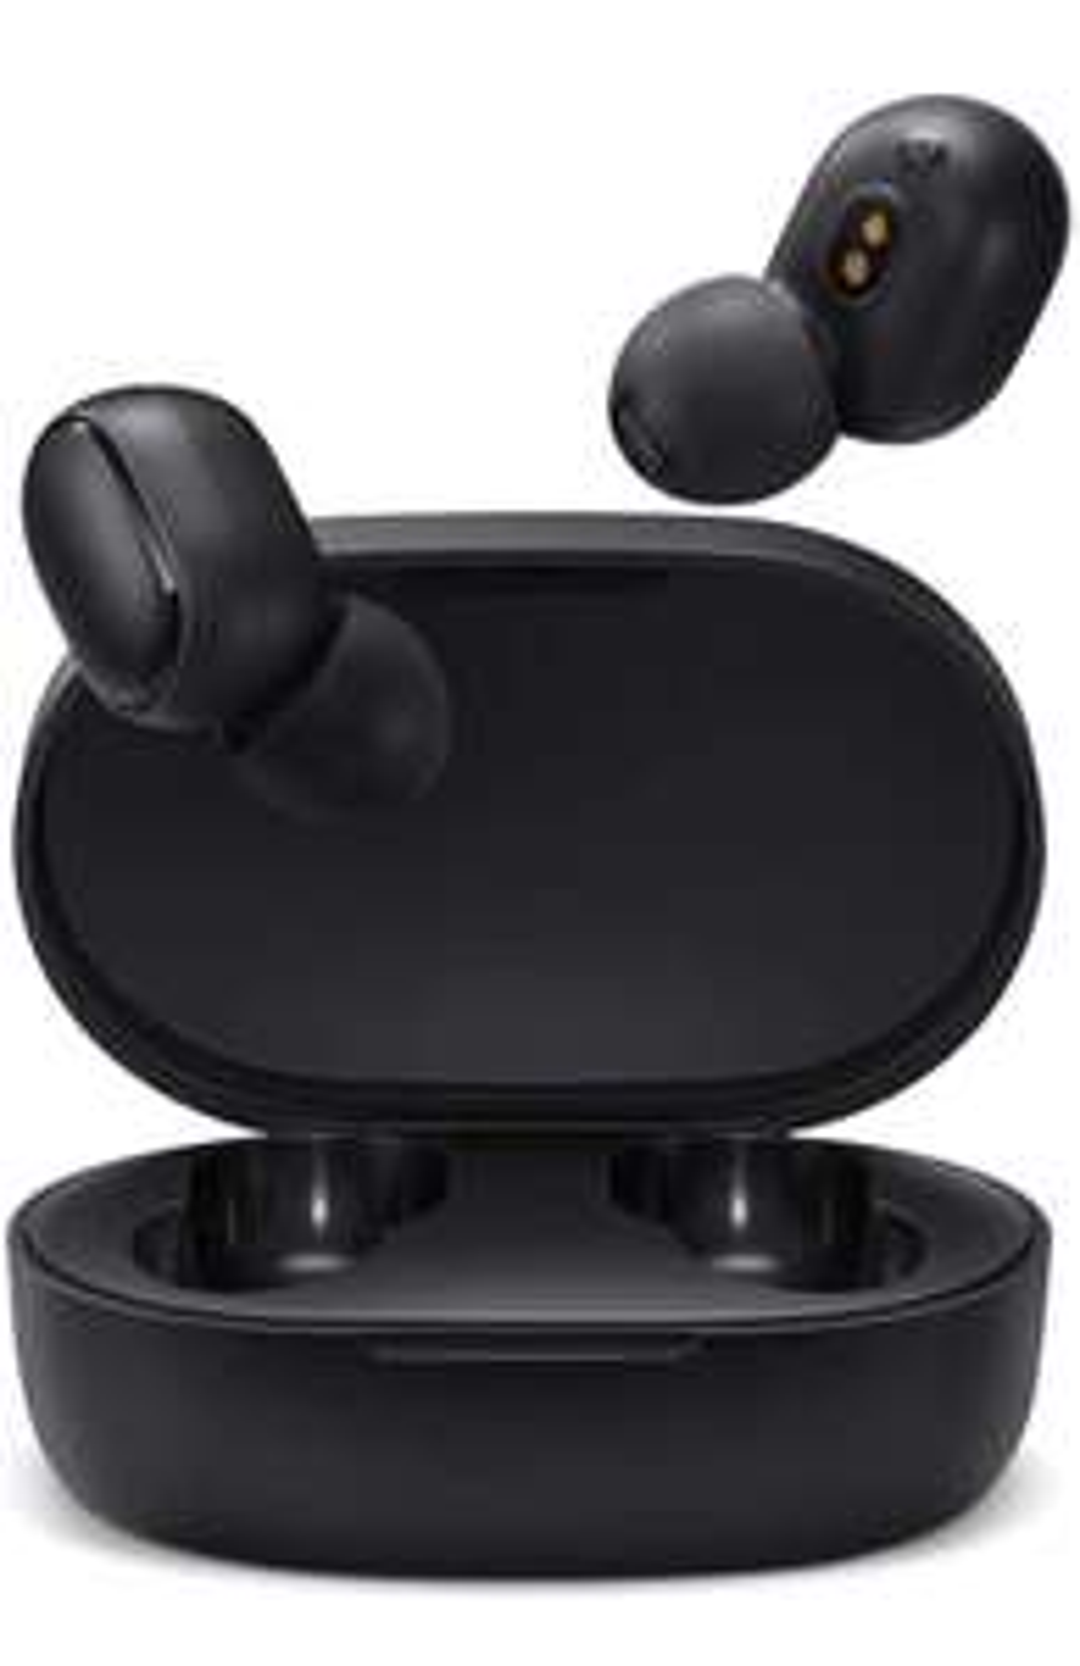 Xiaomi Mi True Wireless Earbuds Basic 2 Headphones - £12.83 + £4.49 Non Prime (UK Mainland) Sold By Amazon EU @ Amazon